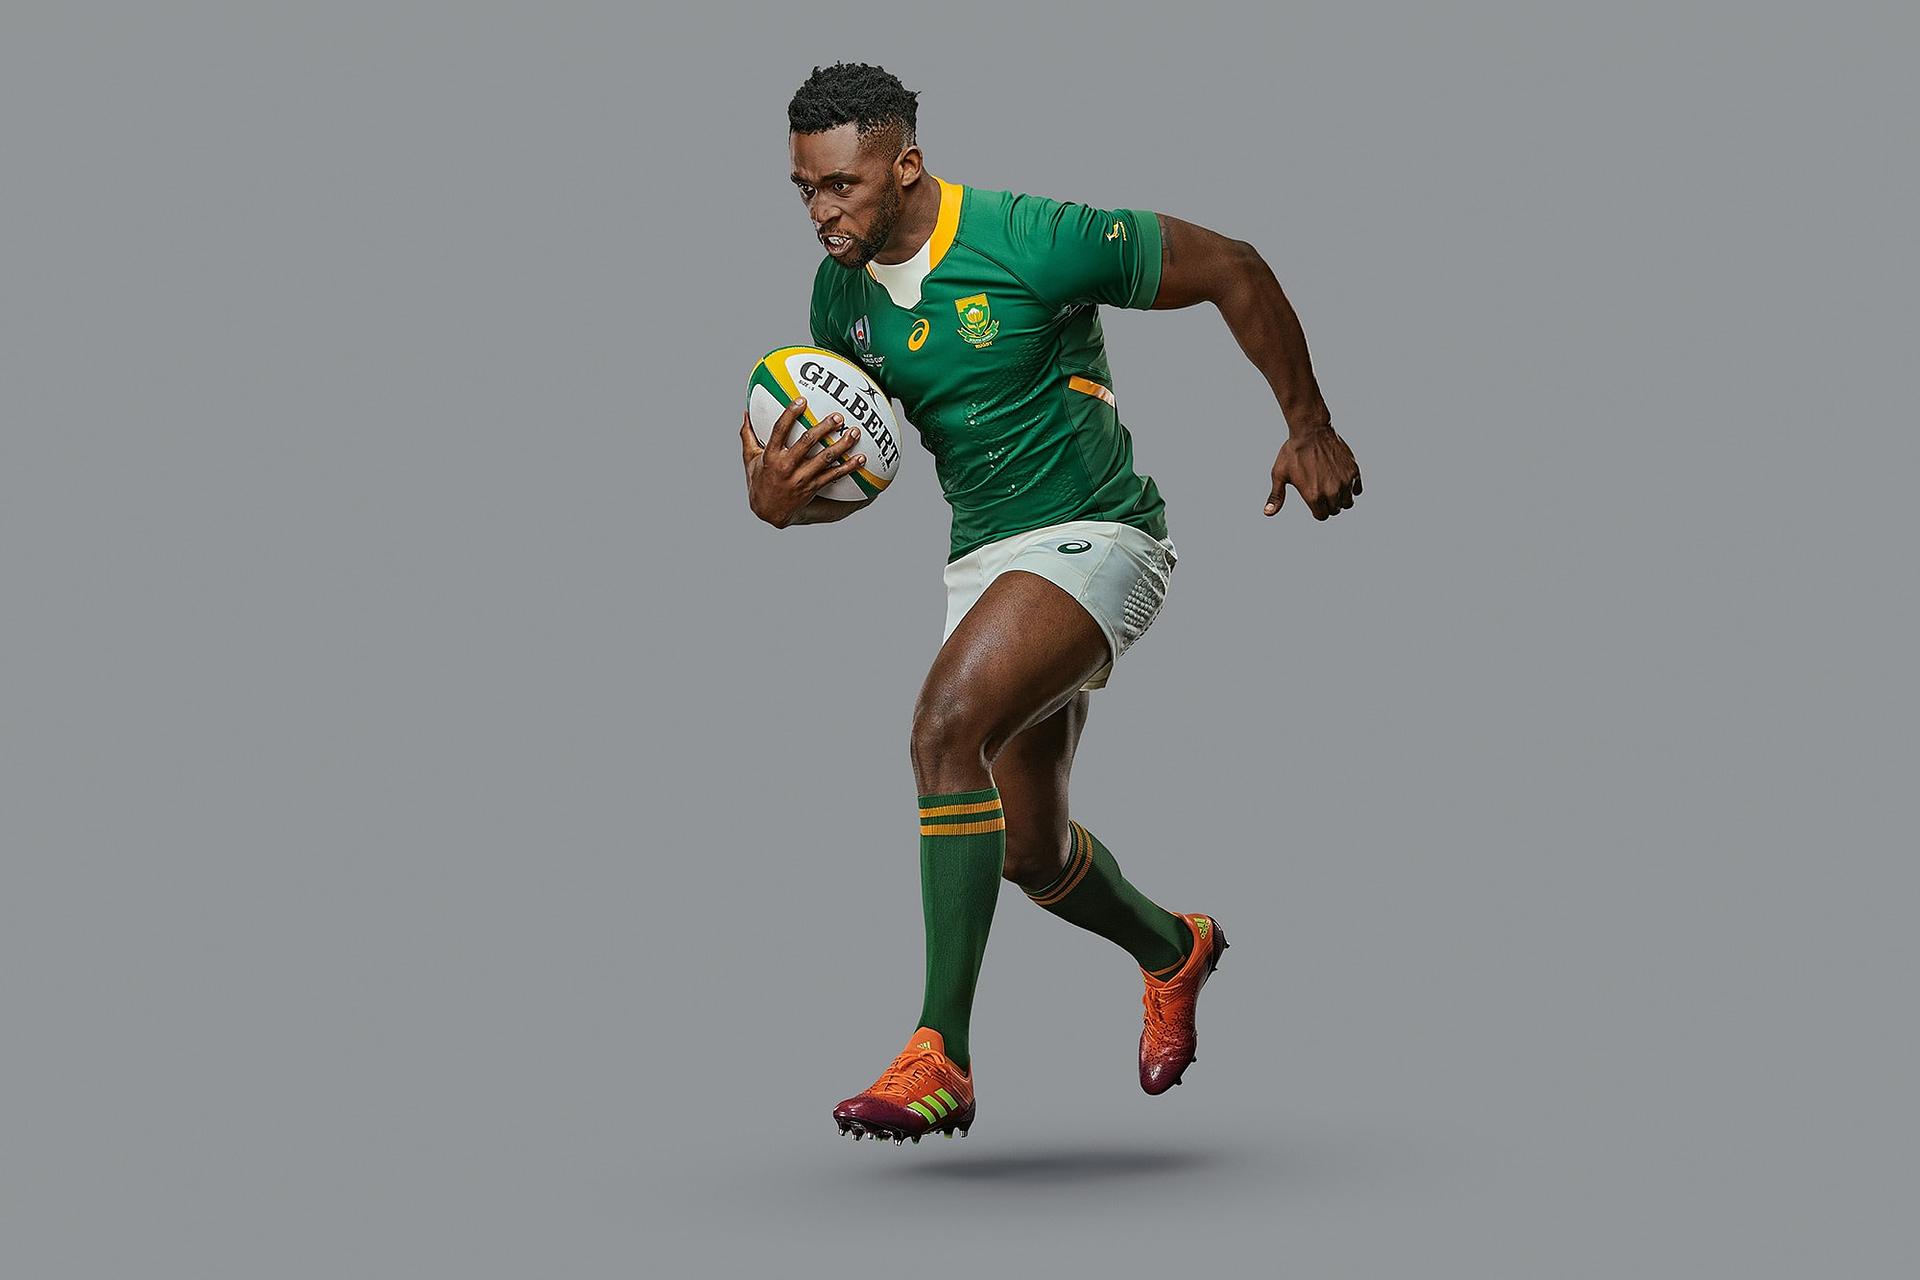 asics rugby print campaign of south african captain siya kolisi